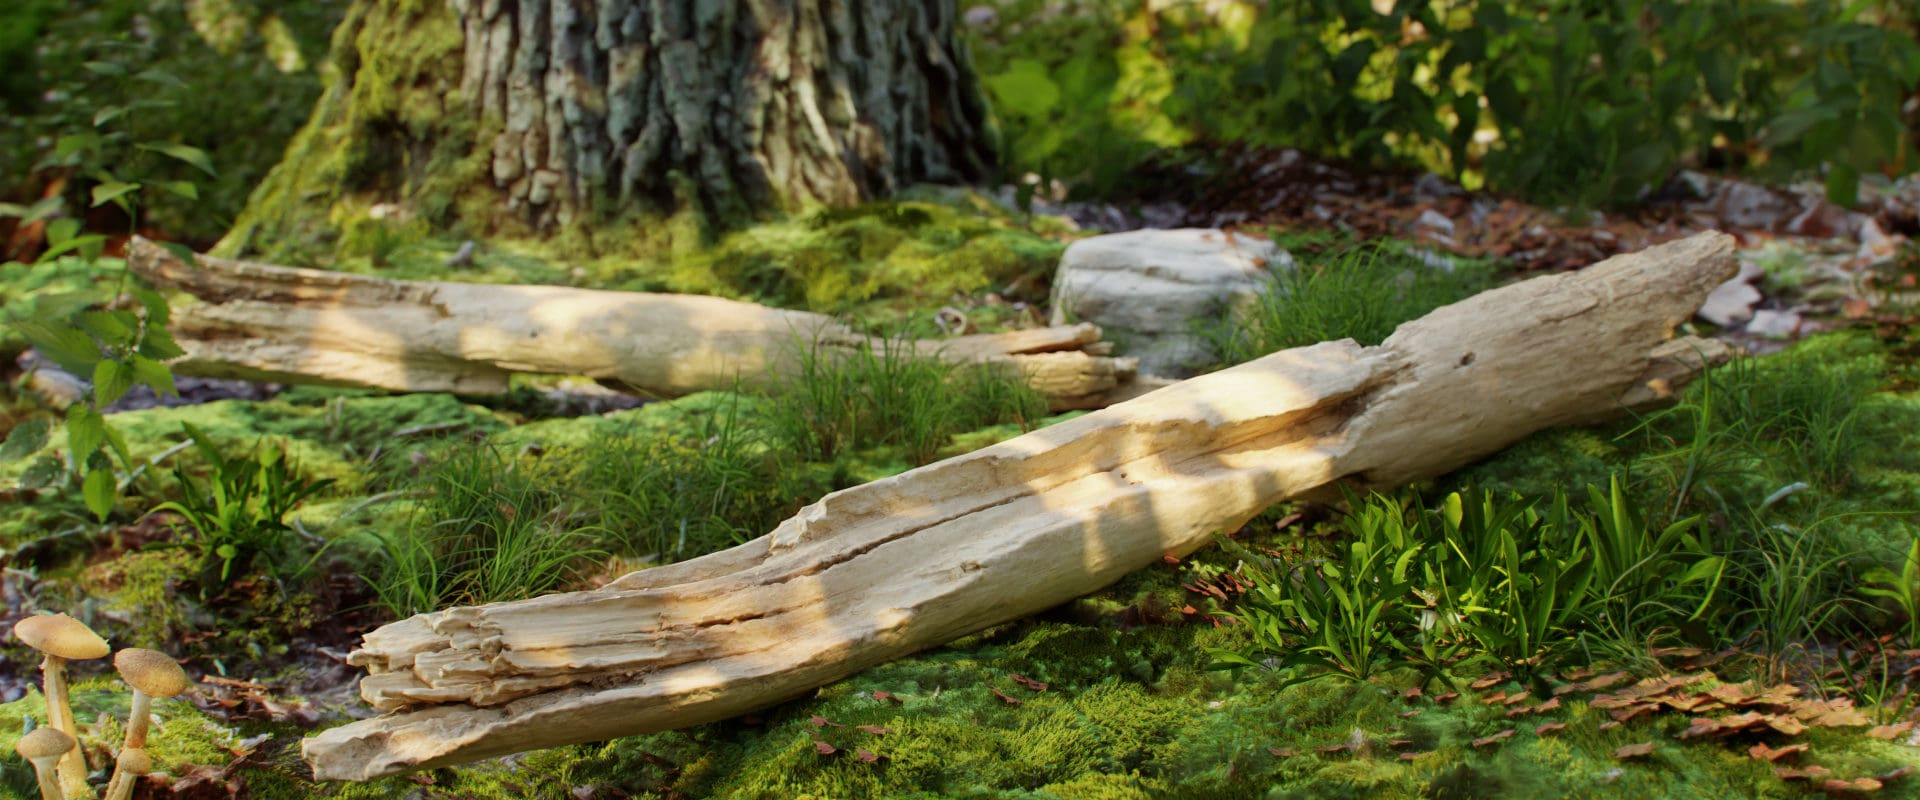 Wood_piece_360_5_45_